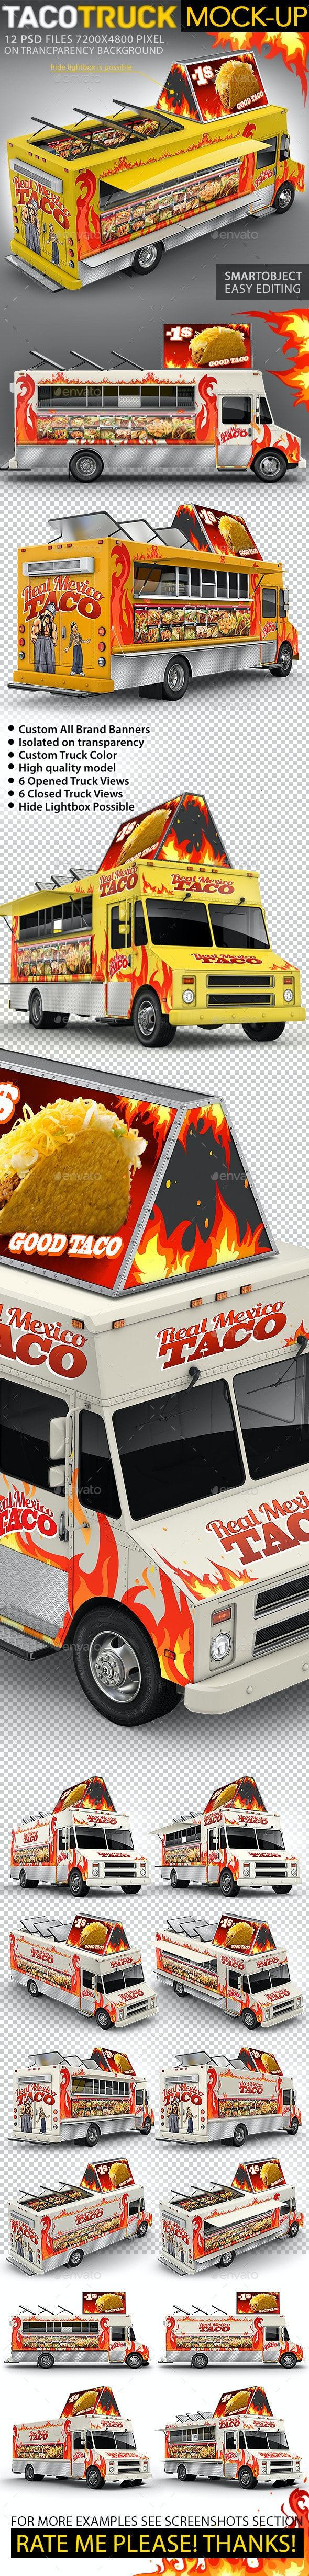 Food Truck, Taco Truck, Step Van Mock-Up - Vehicle Wraps Print